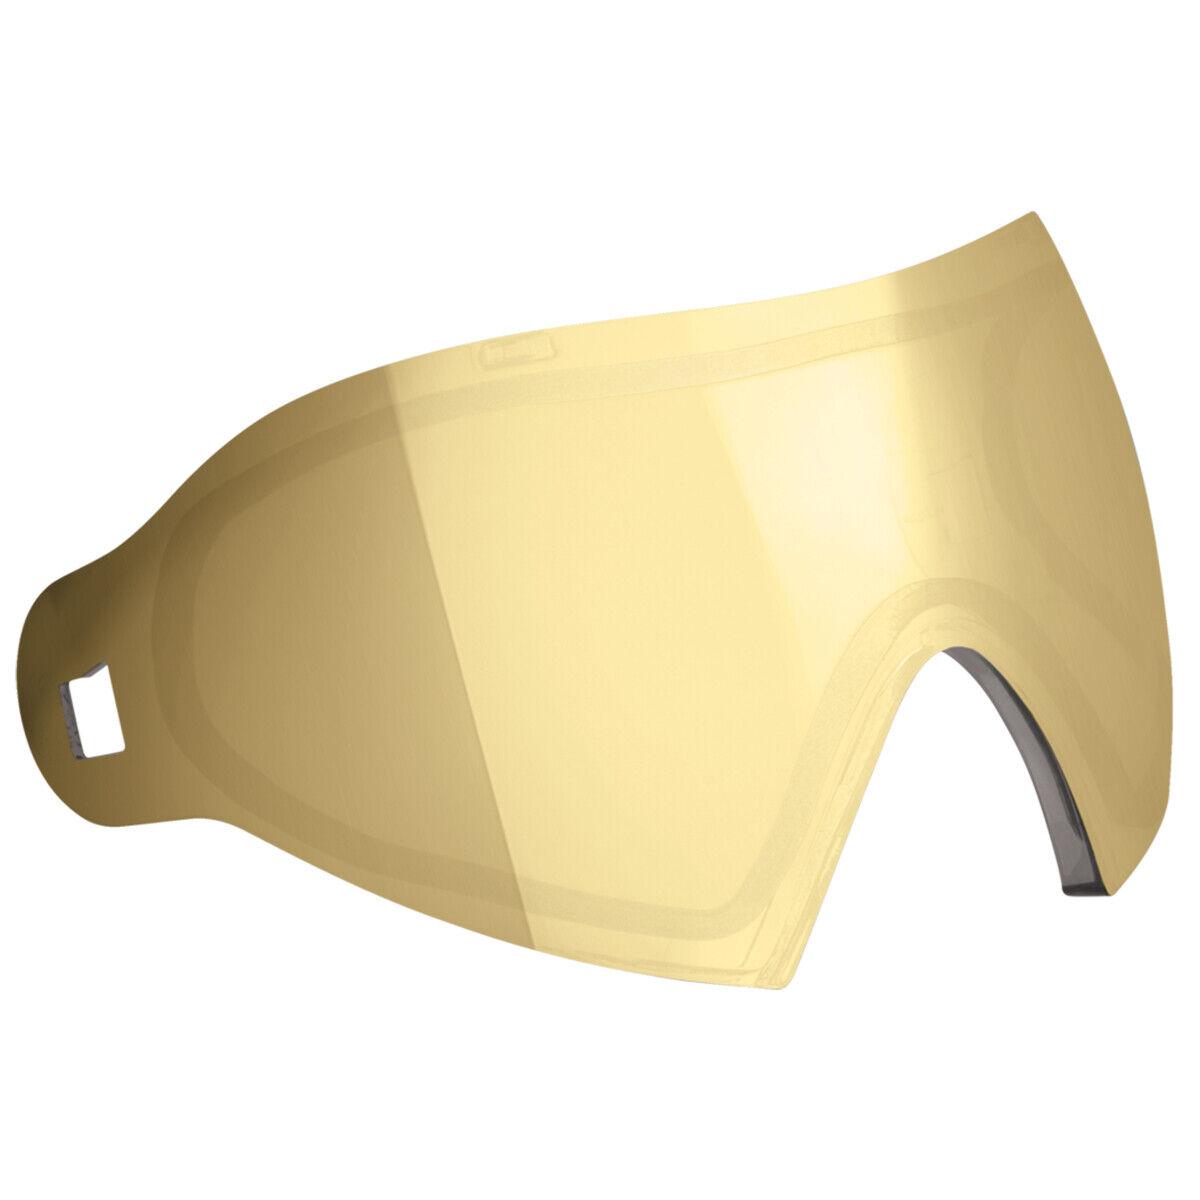 Dye i4   i5 Thermal Dyetanium Mirror Goggle Lens - Smoke   gold